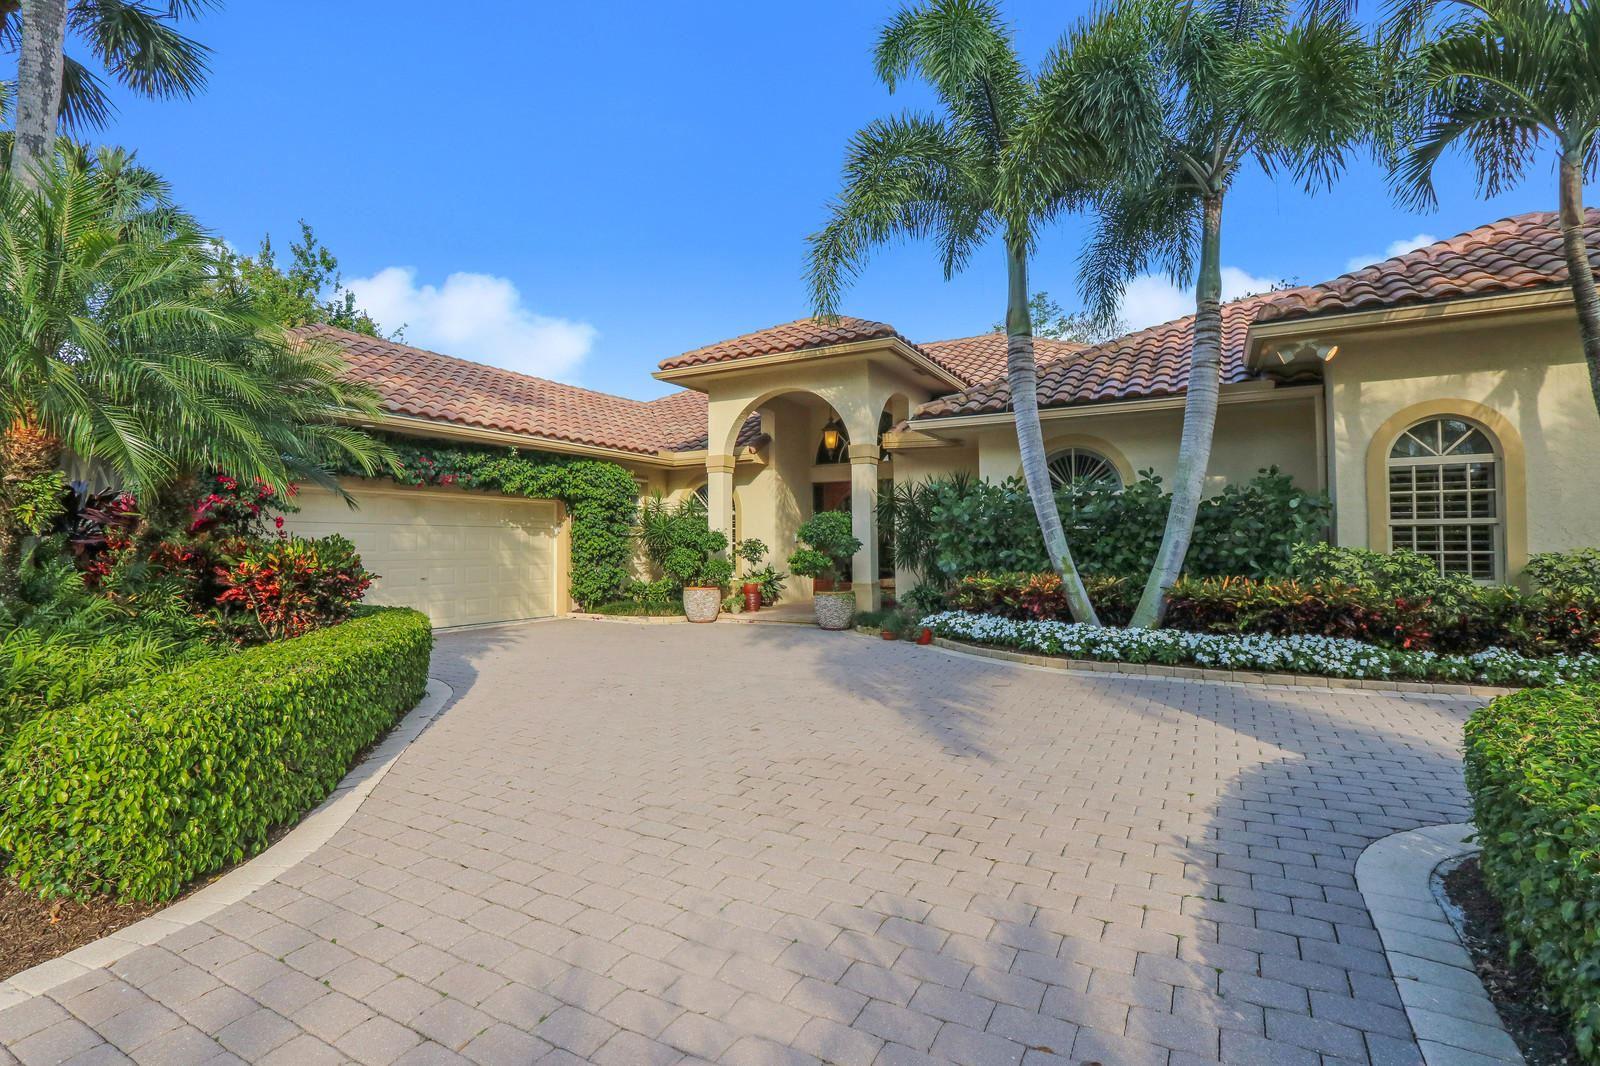 Photo of 16 Cayman Place, Palm Beach Gardens, FL 33418 (MLS # RX-10709565)